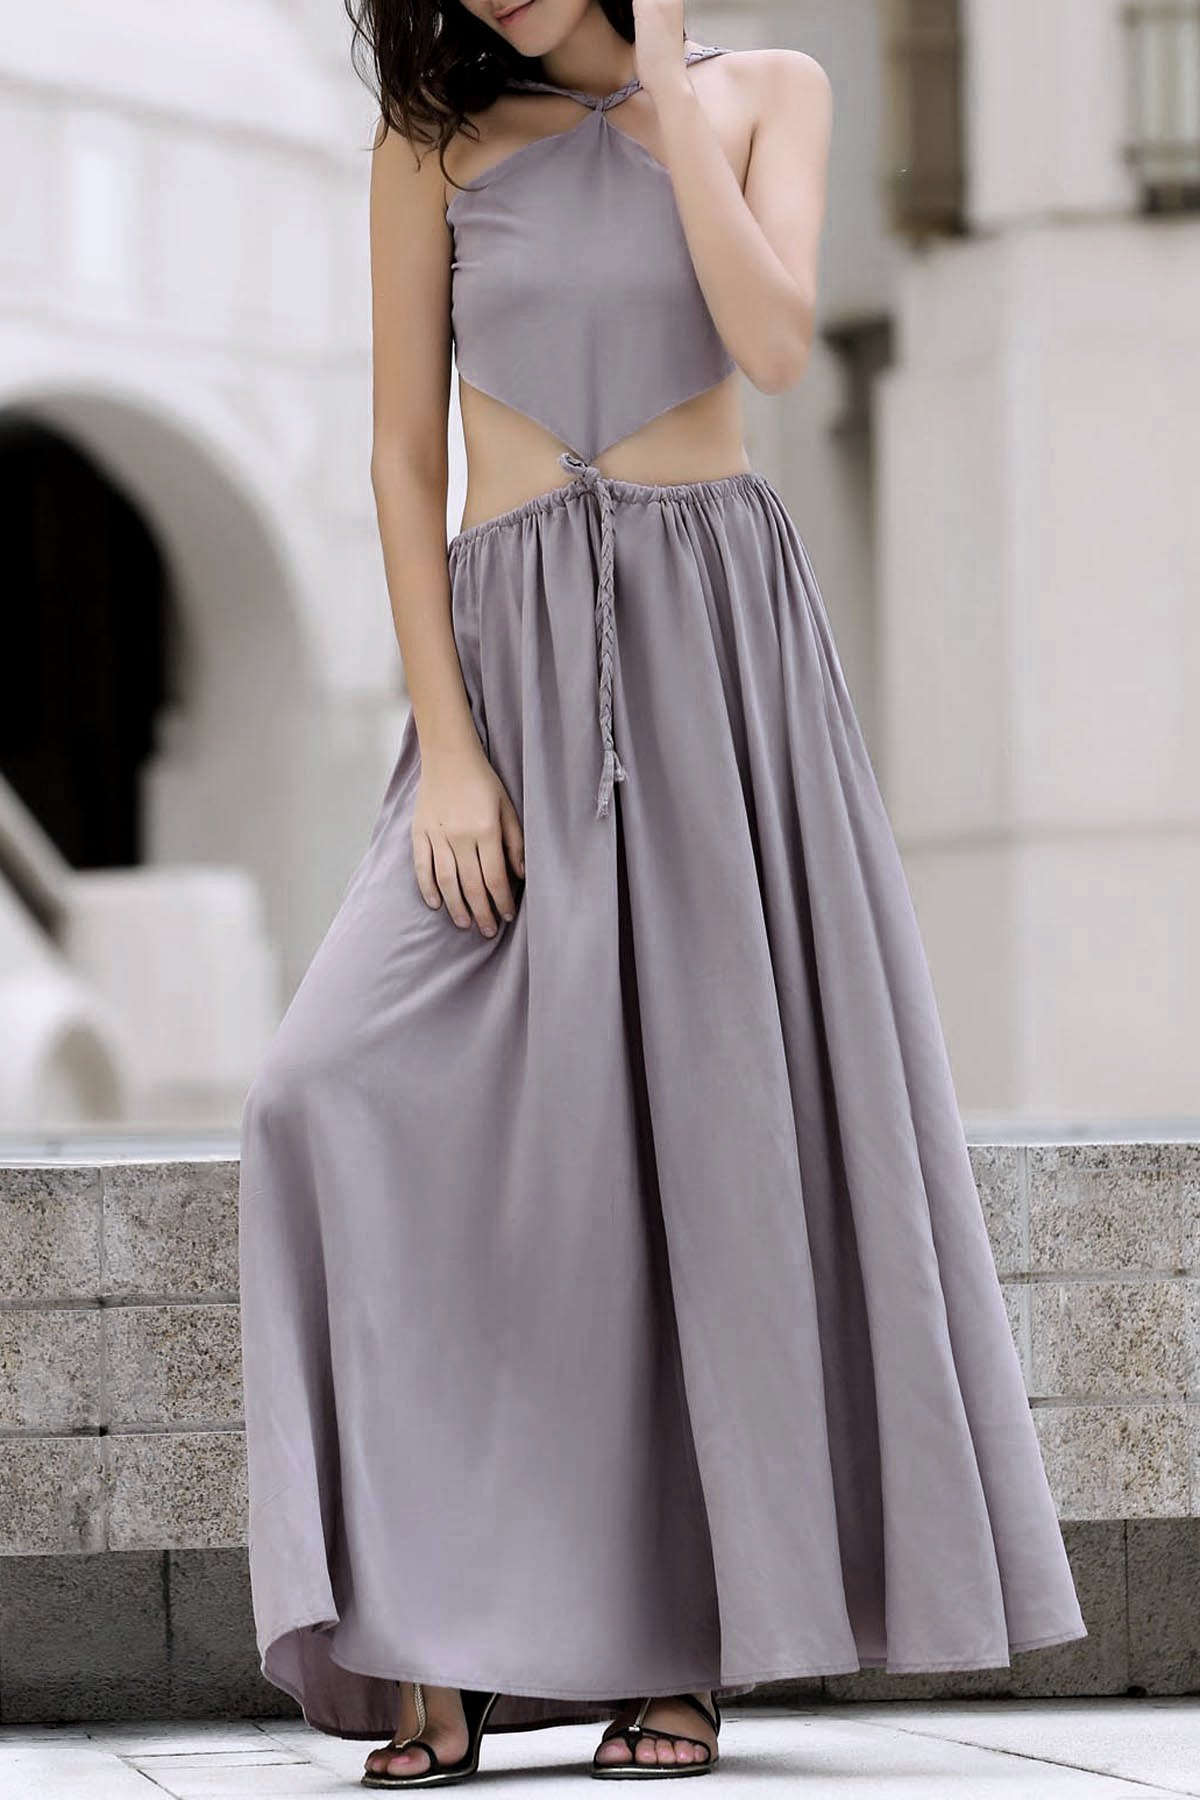 Backless Swingy Boho Dress